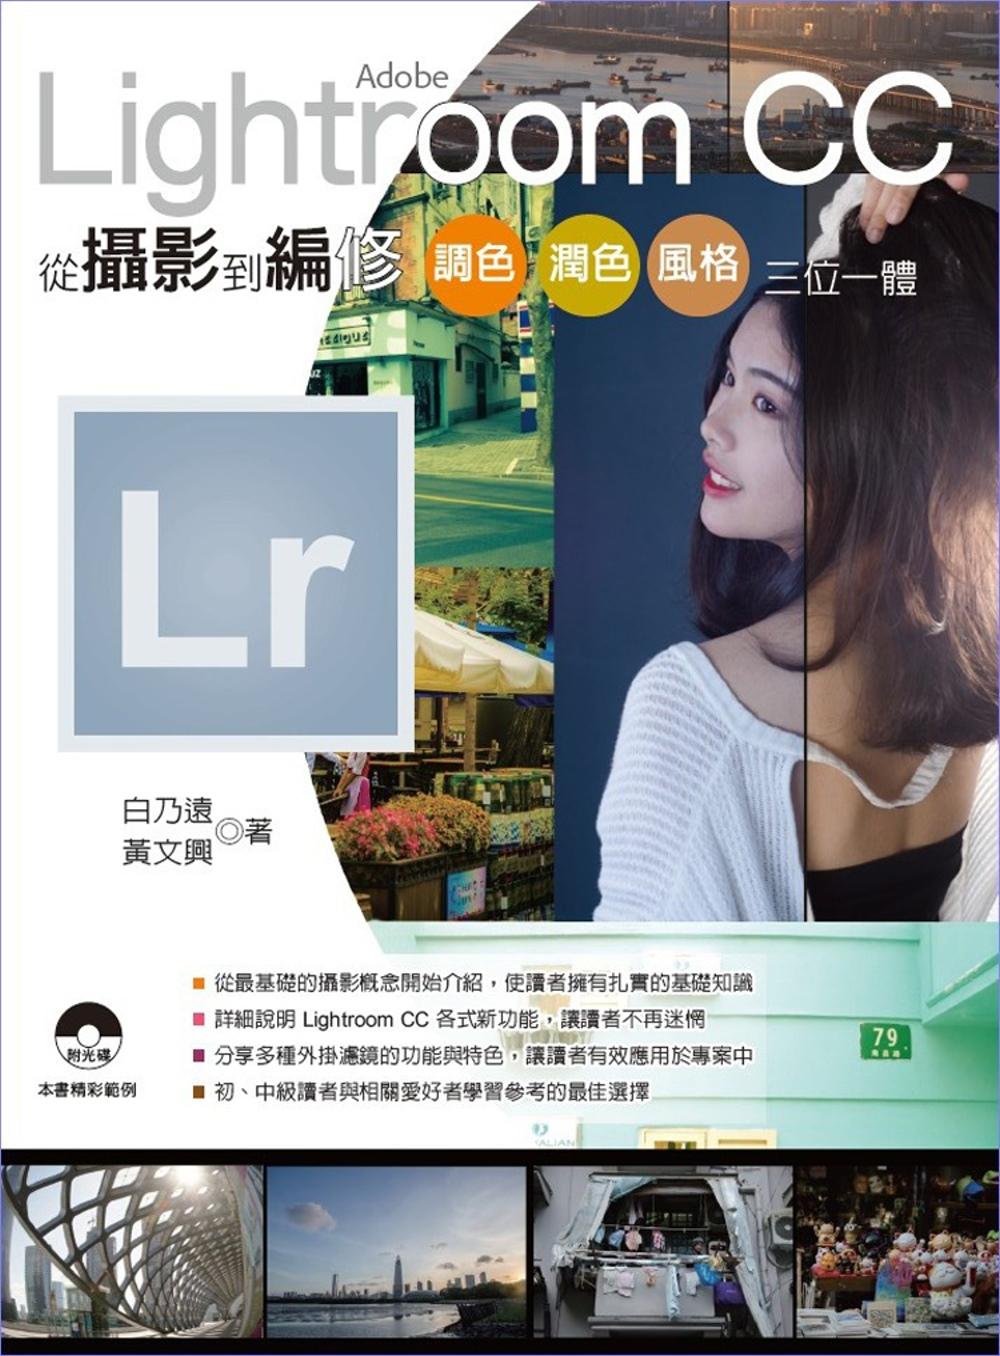 Adobe Lightroom CC 從攝影到編修:調色、潤色、風格、三位一體